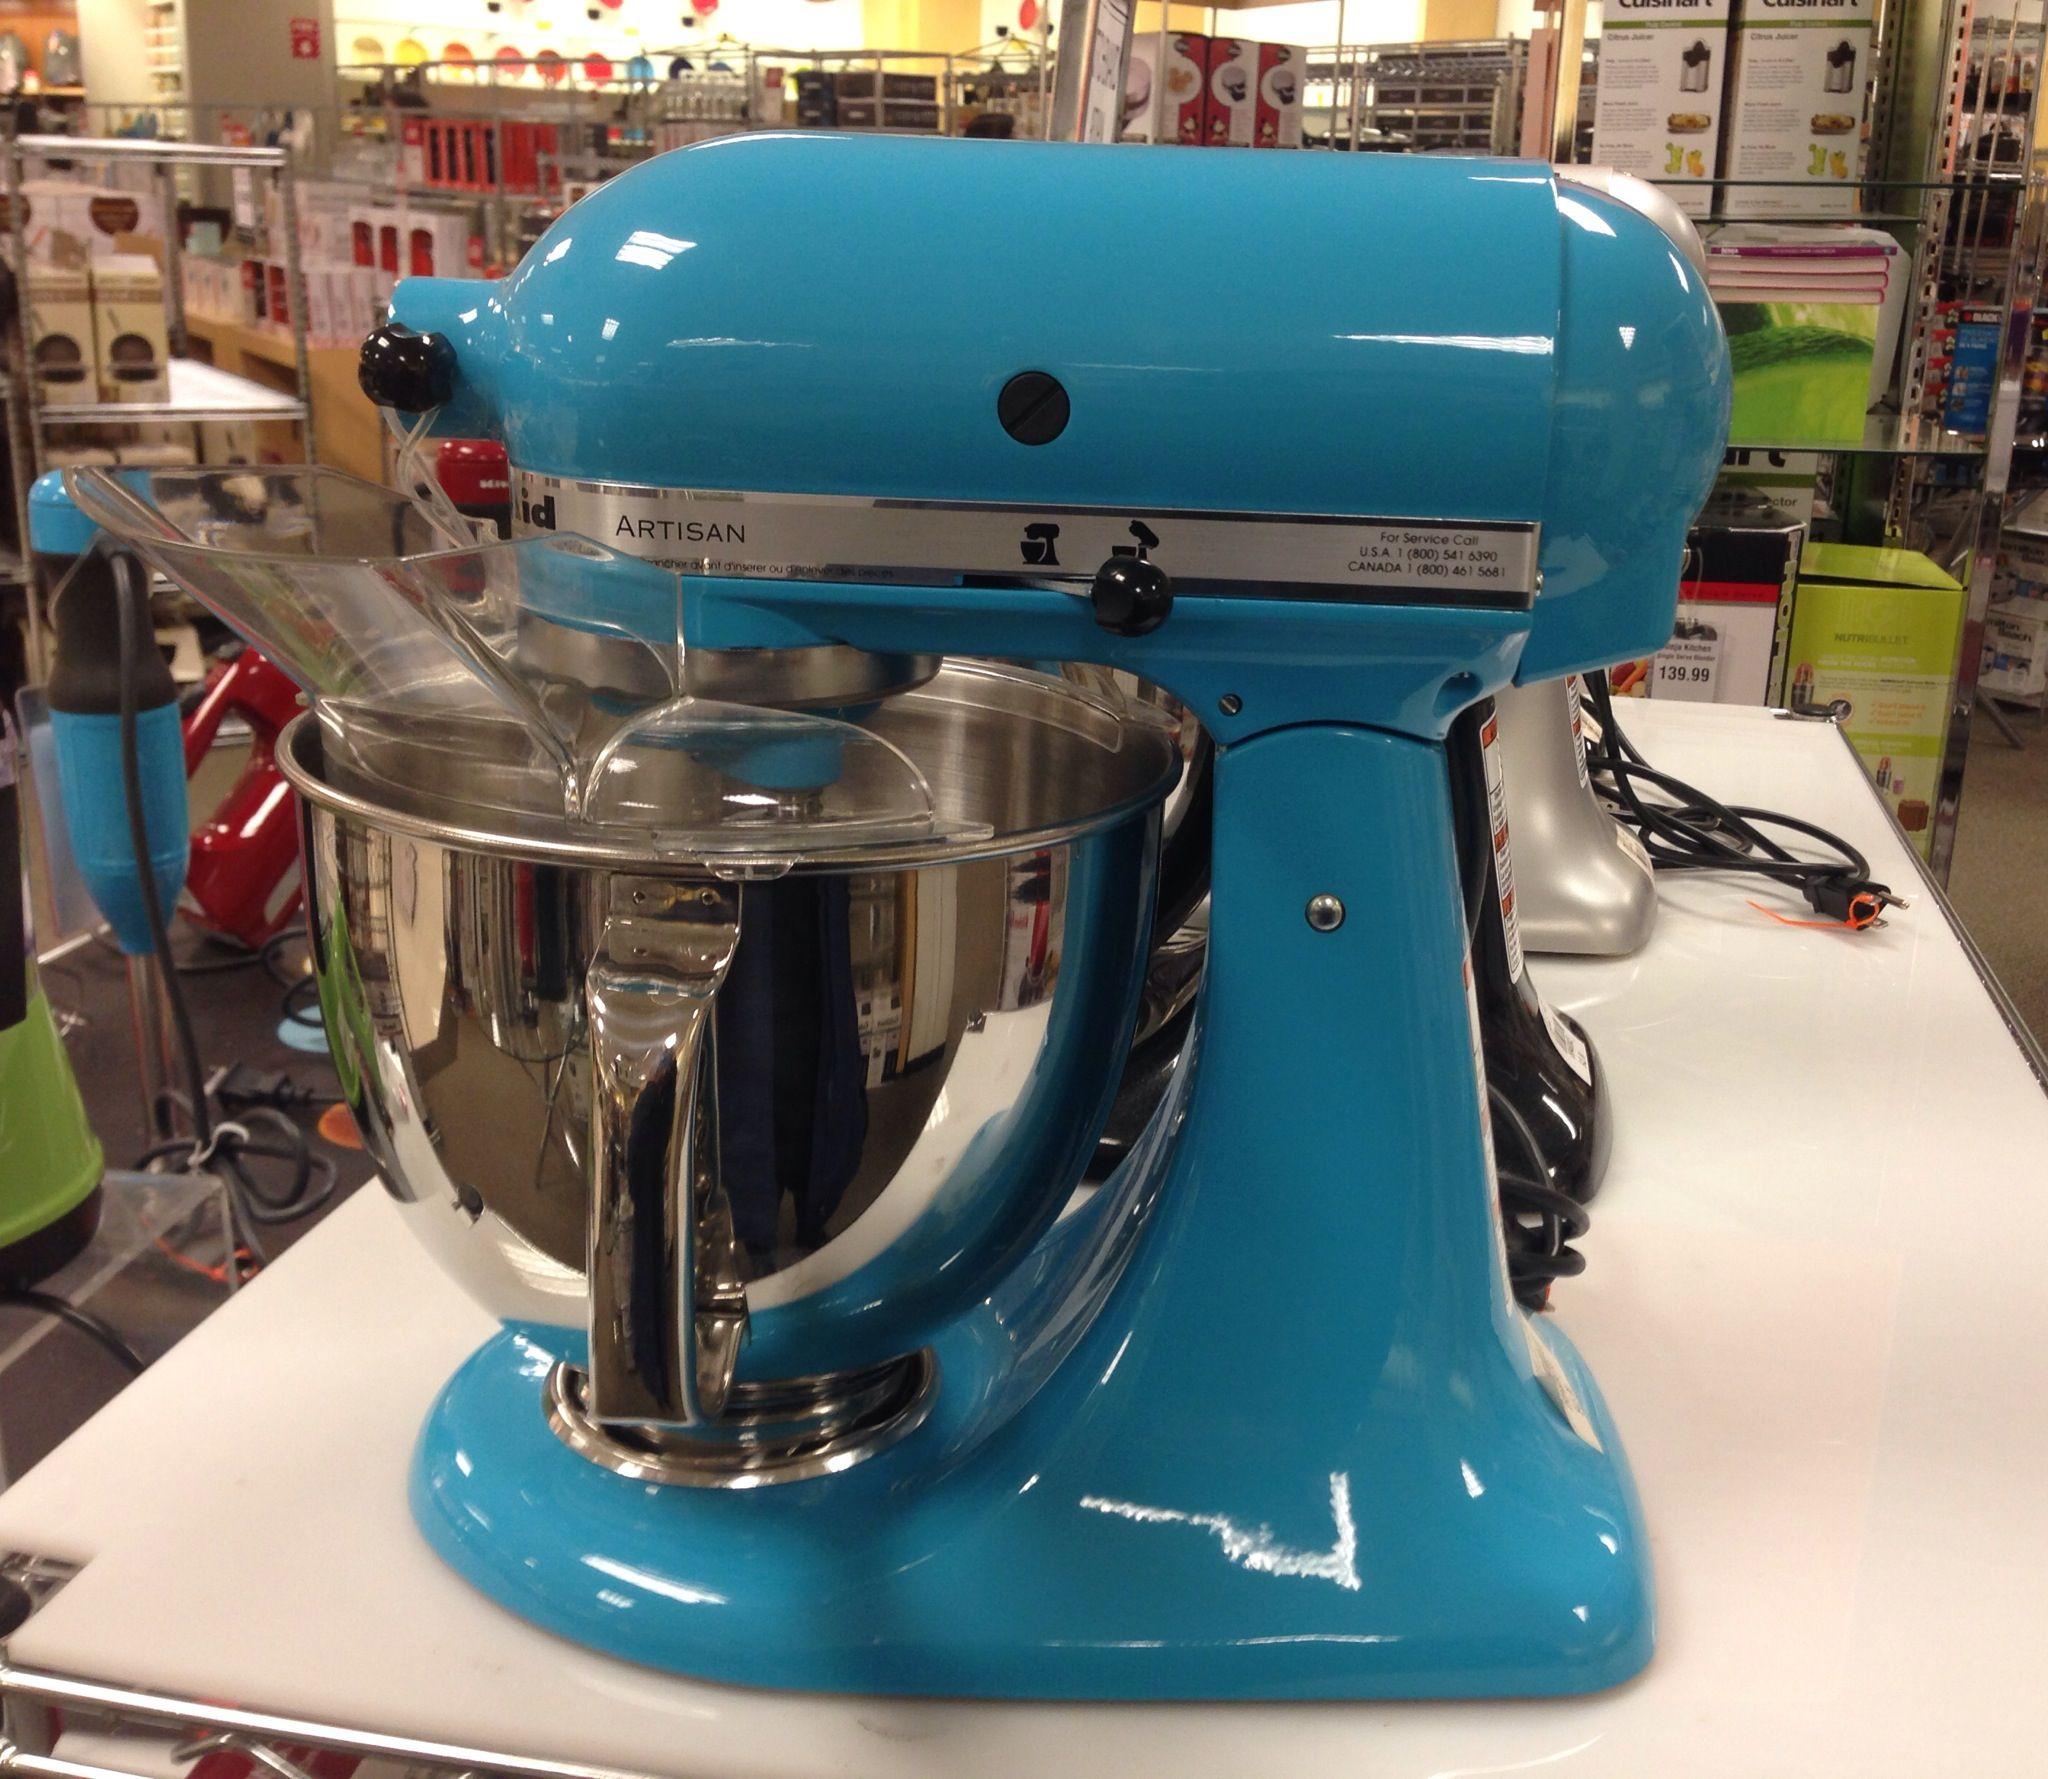 Crystal Blue | Kitchenaid Mixers | Pinterest | Kitchenaid mixer ...